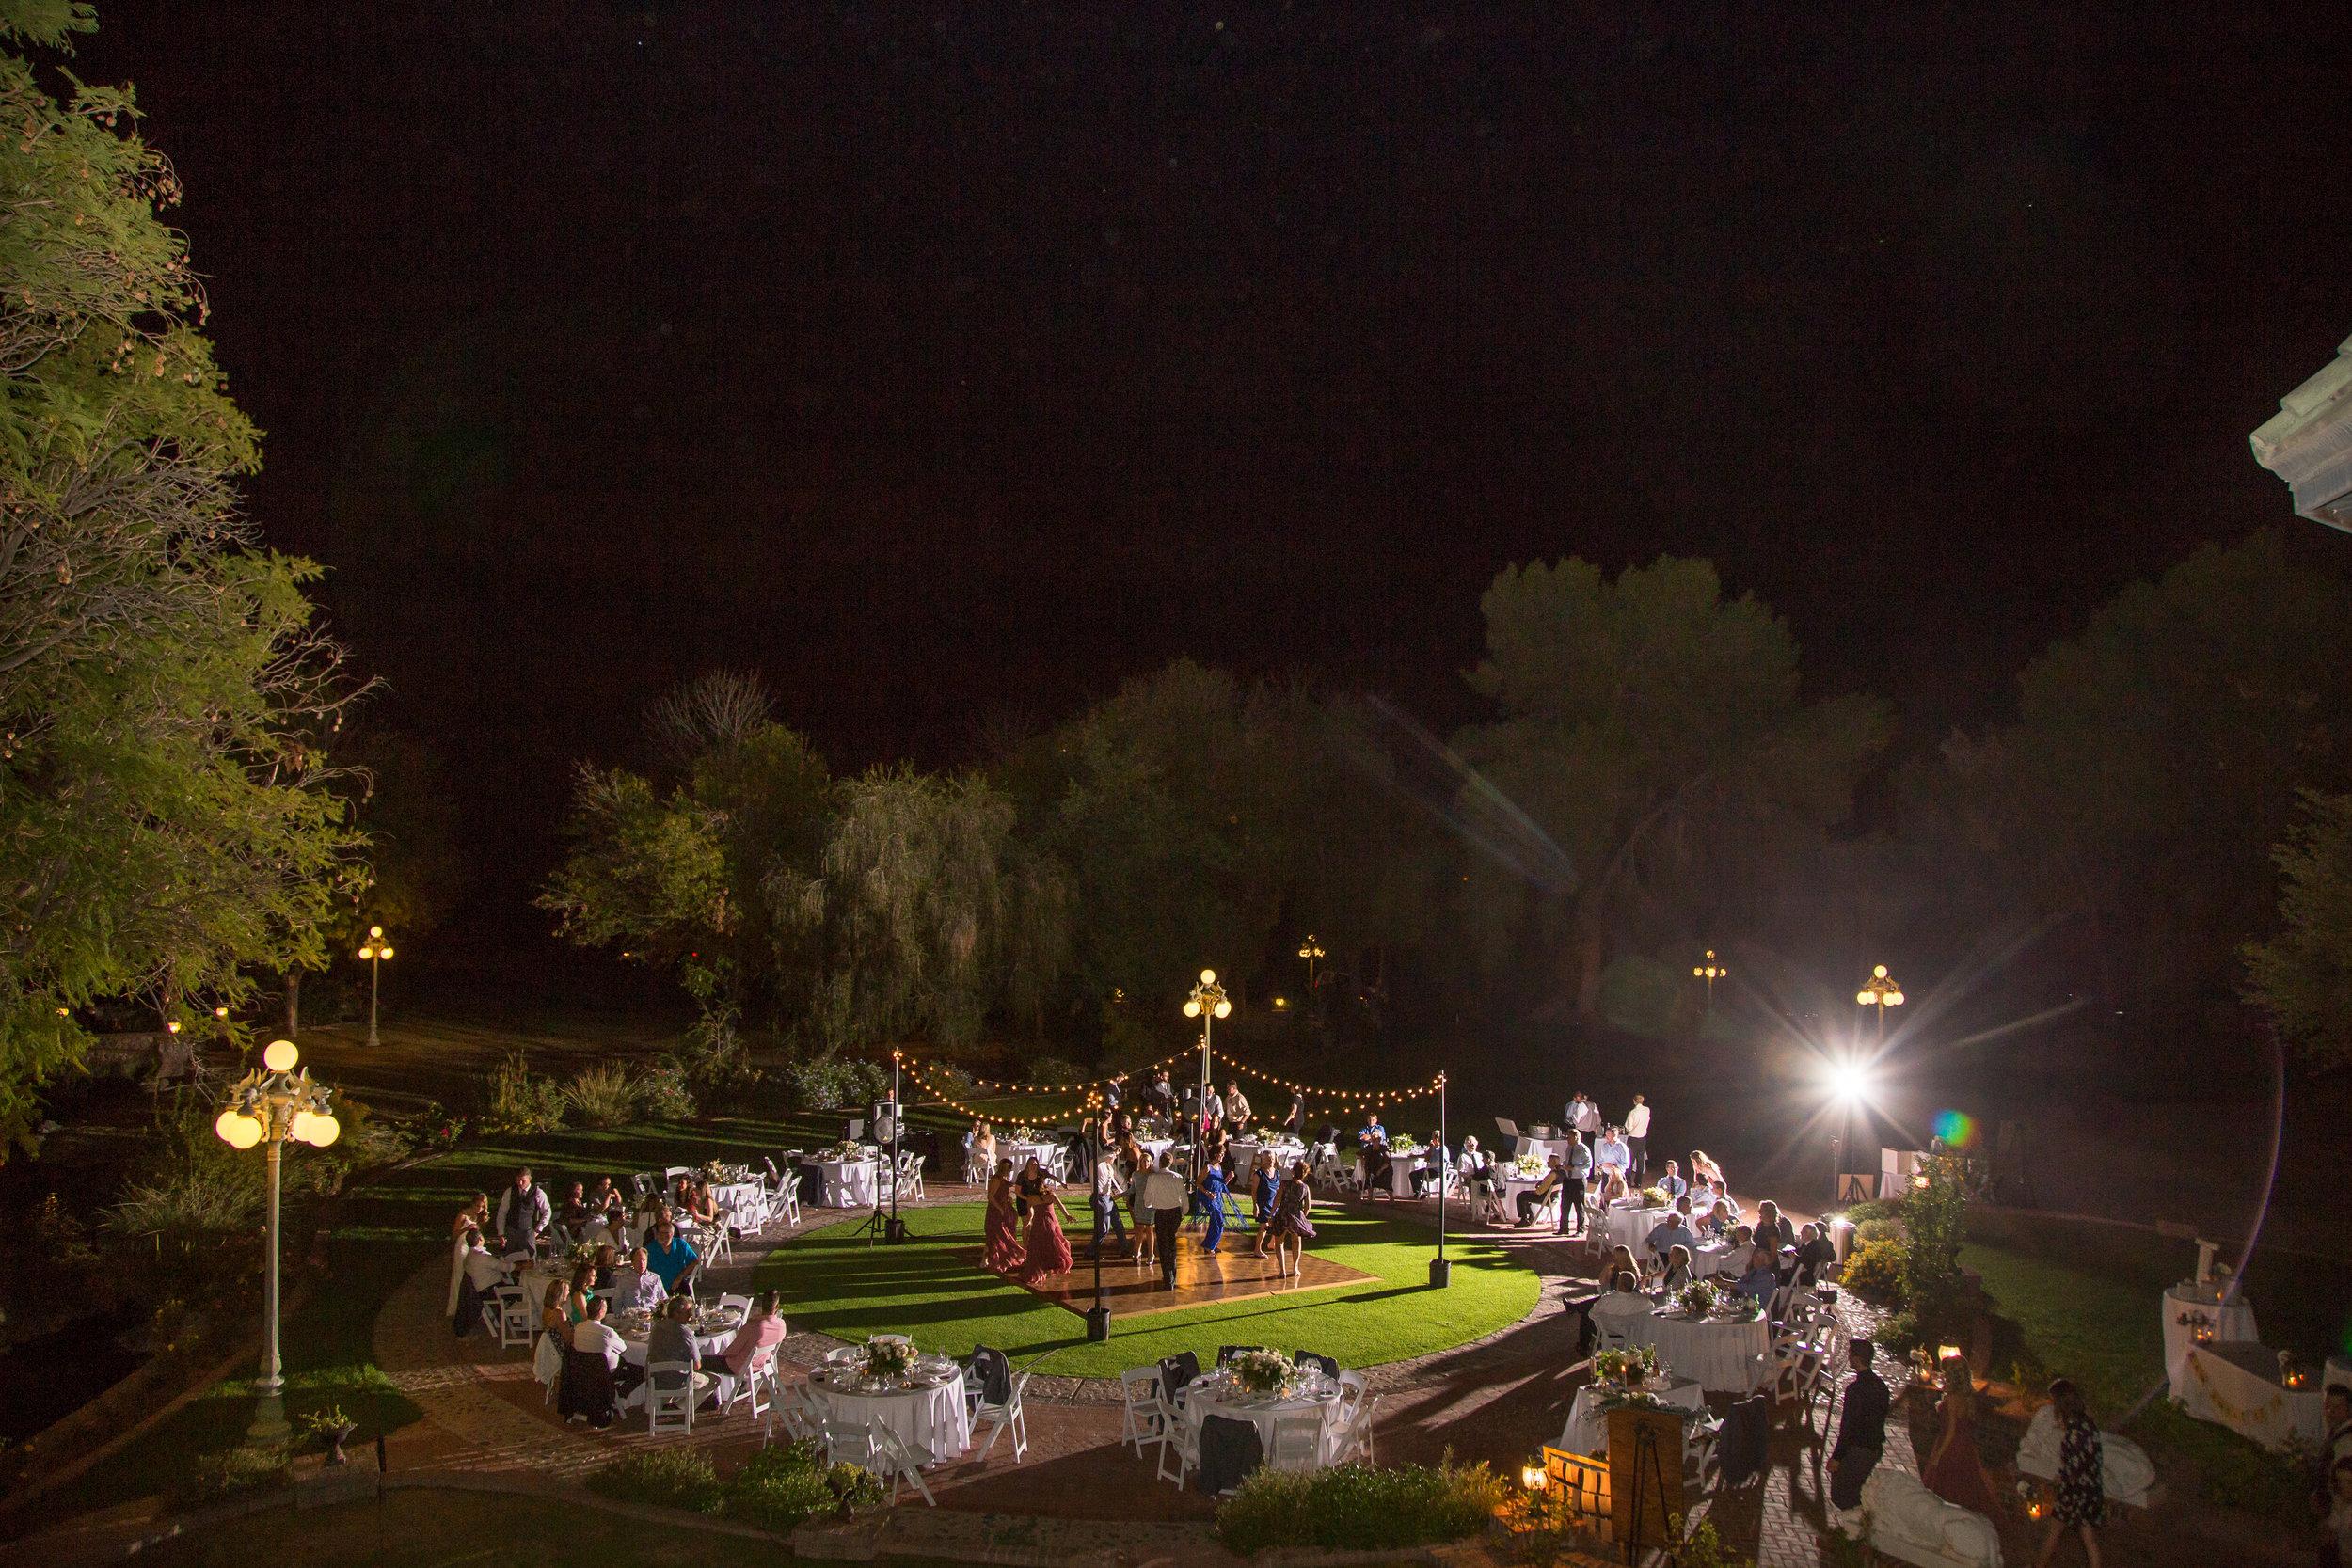 Reception under the stars at Chateau de Vie